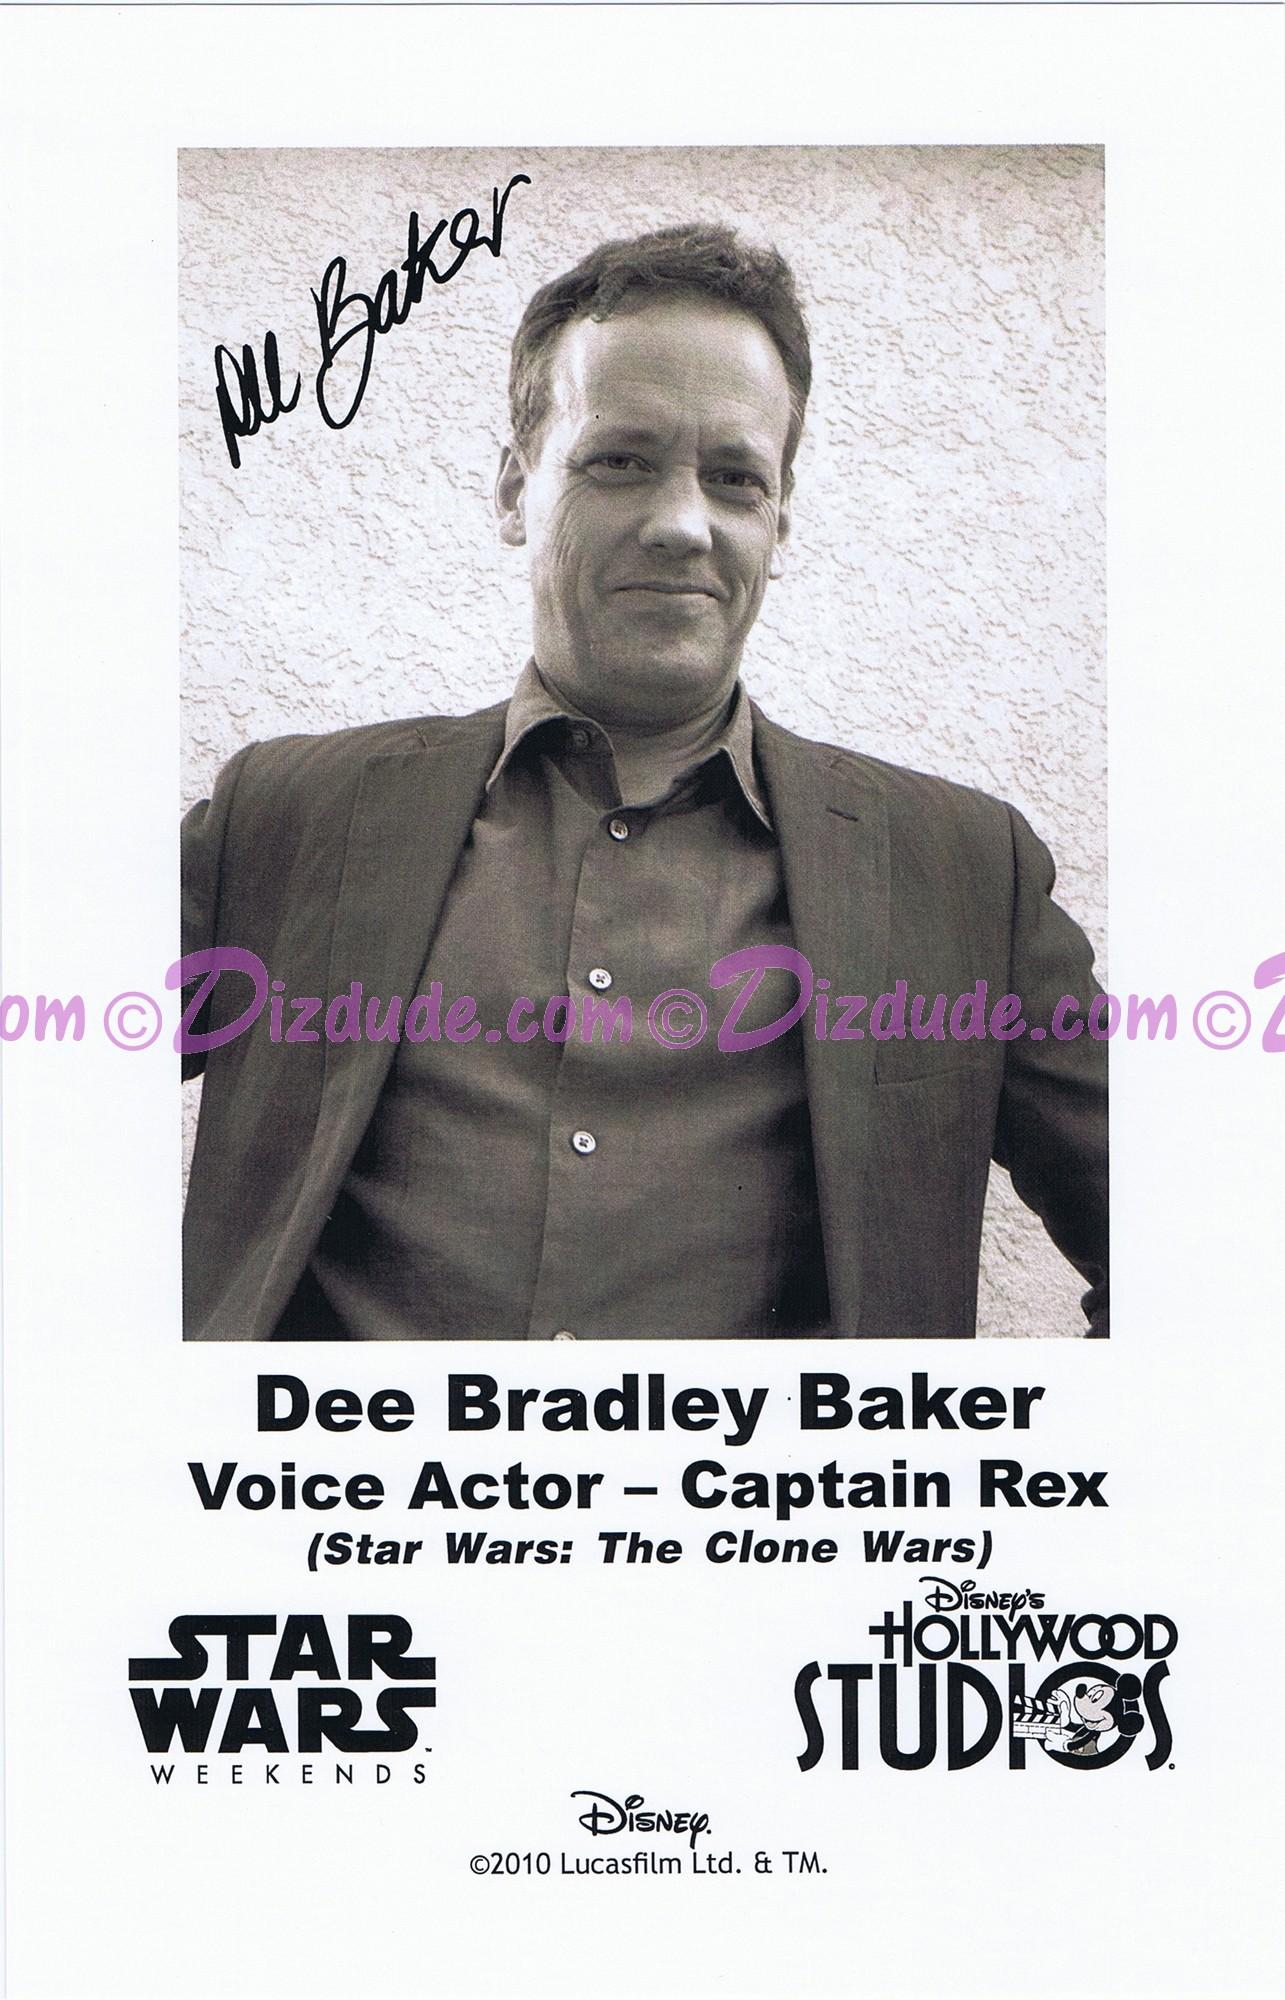 Dee Bradley Baker the voice of Captain Rex Presigned Official Star Wars Weekends 2010 Celebrity Collector Photo © Dizdude.com